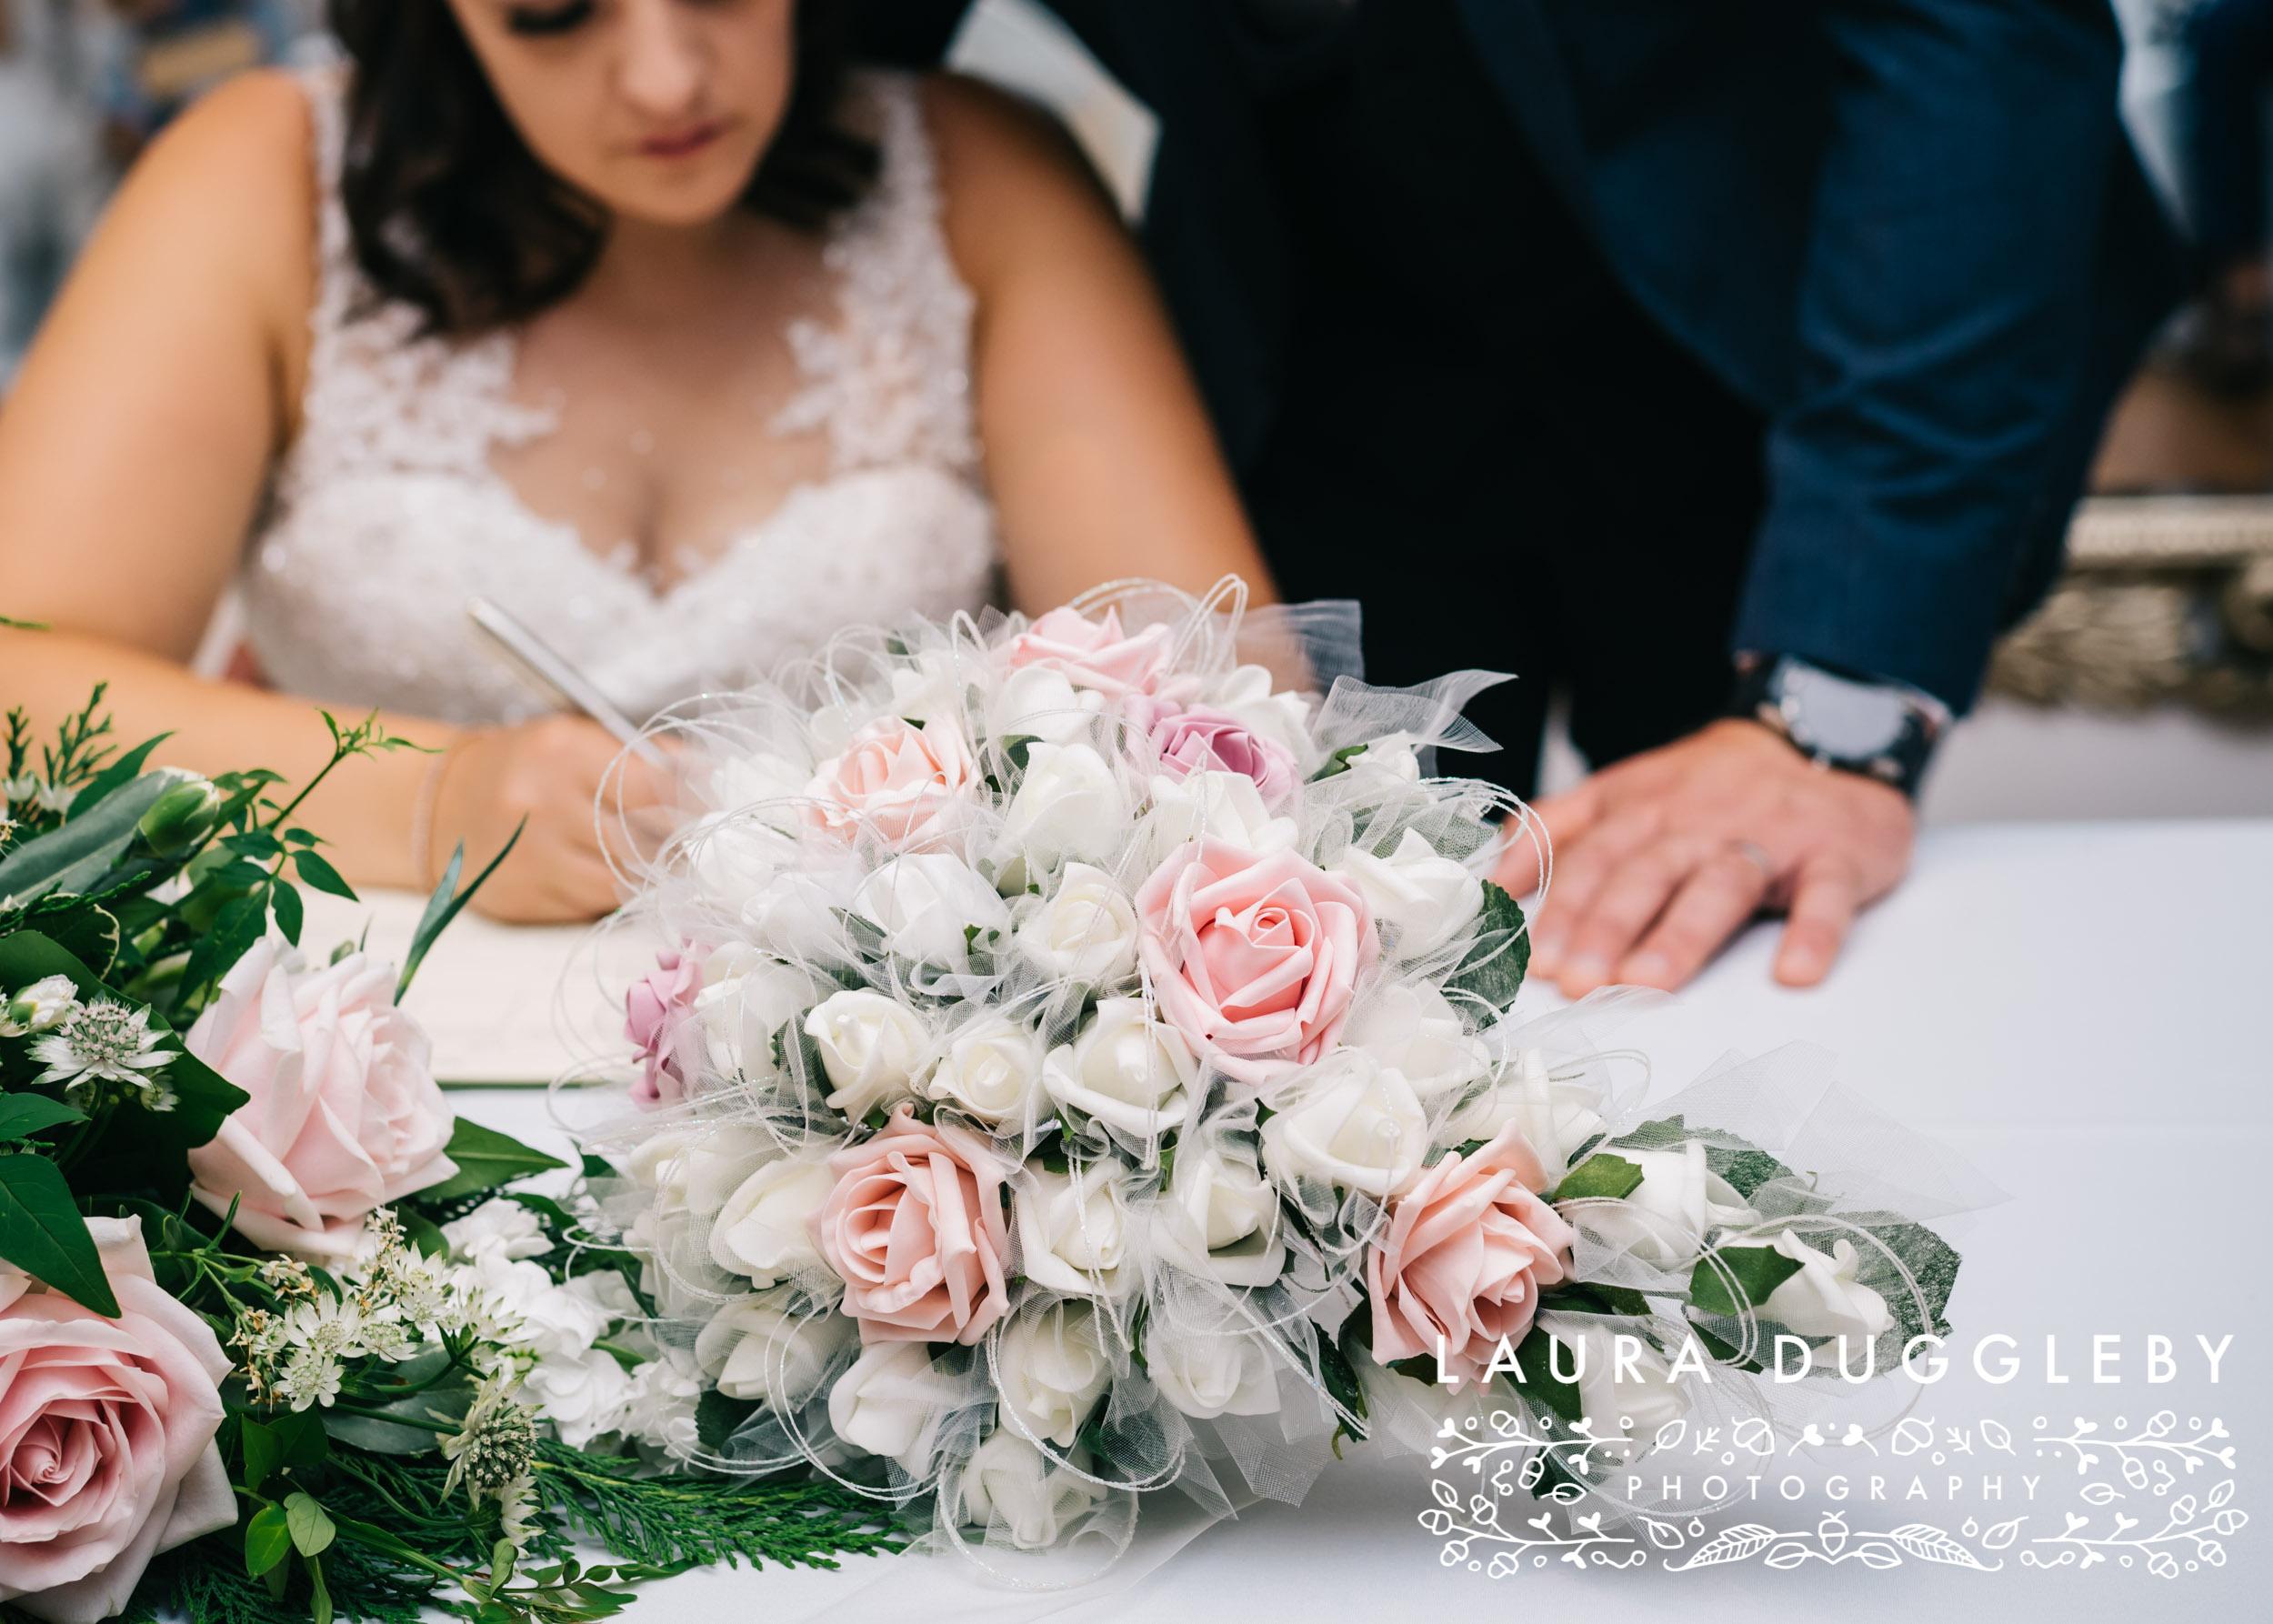 Accrington Wedding Photographer - Sparth House Hotel20